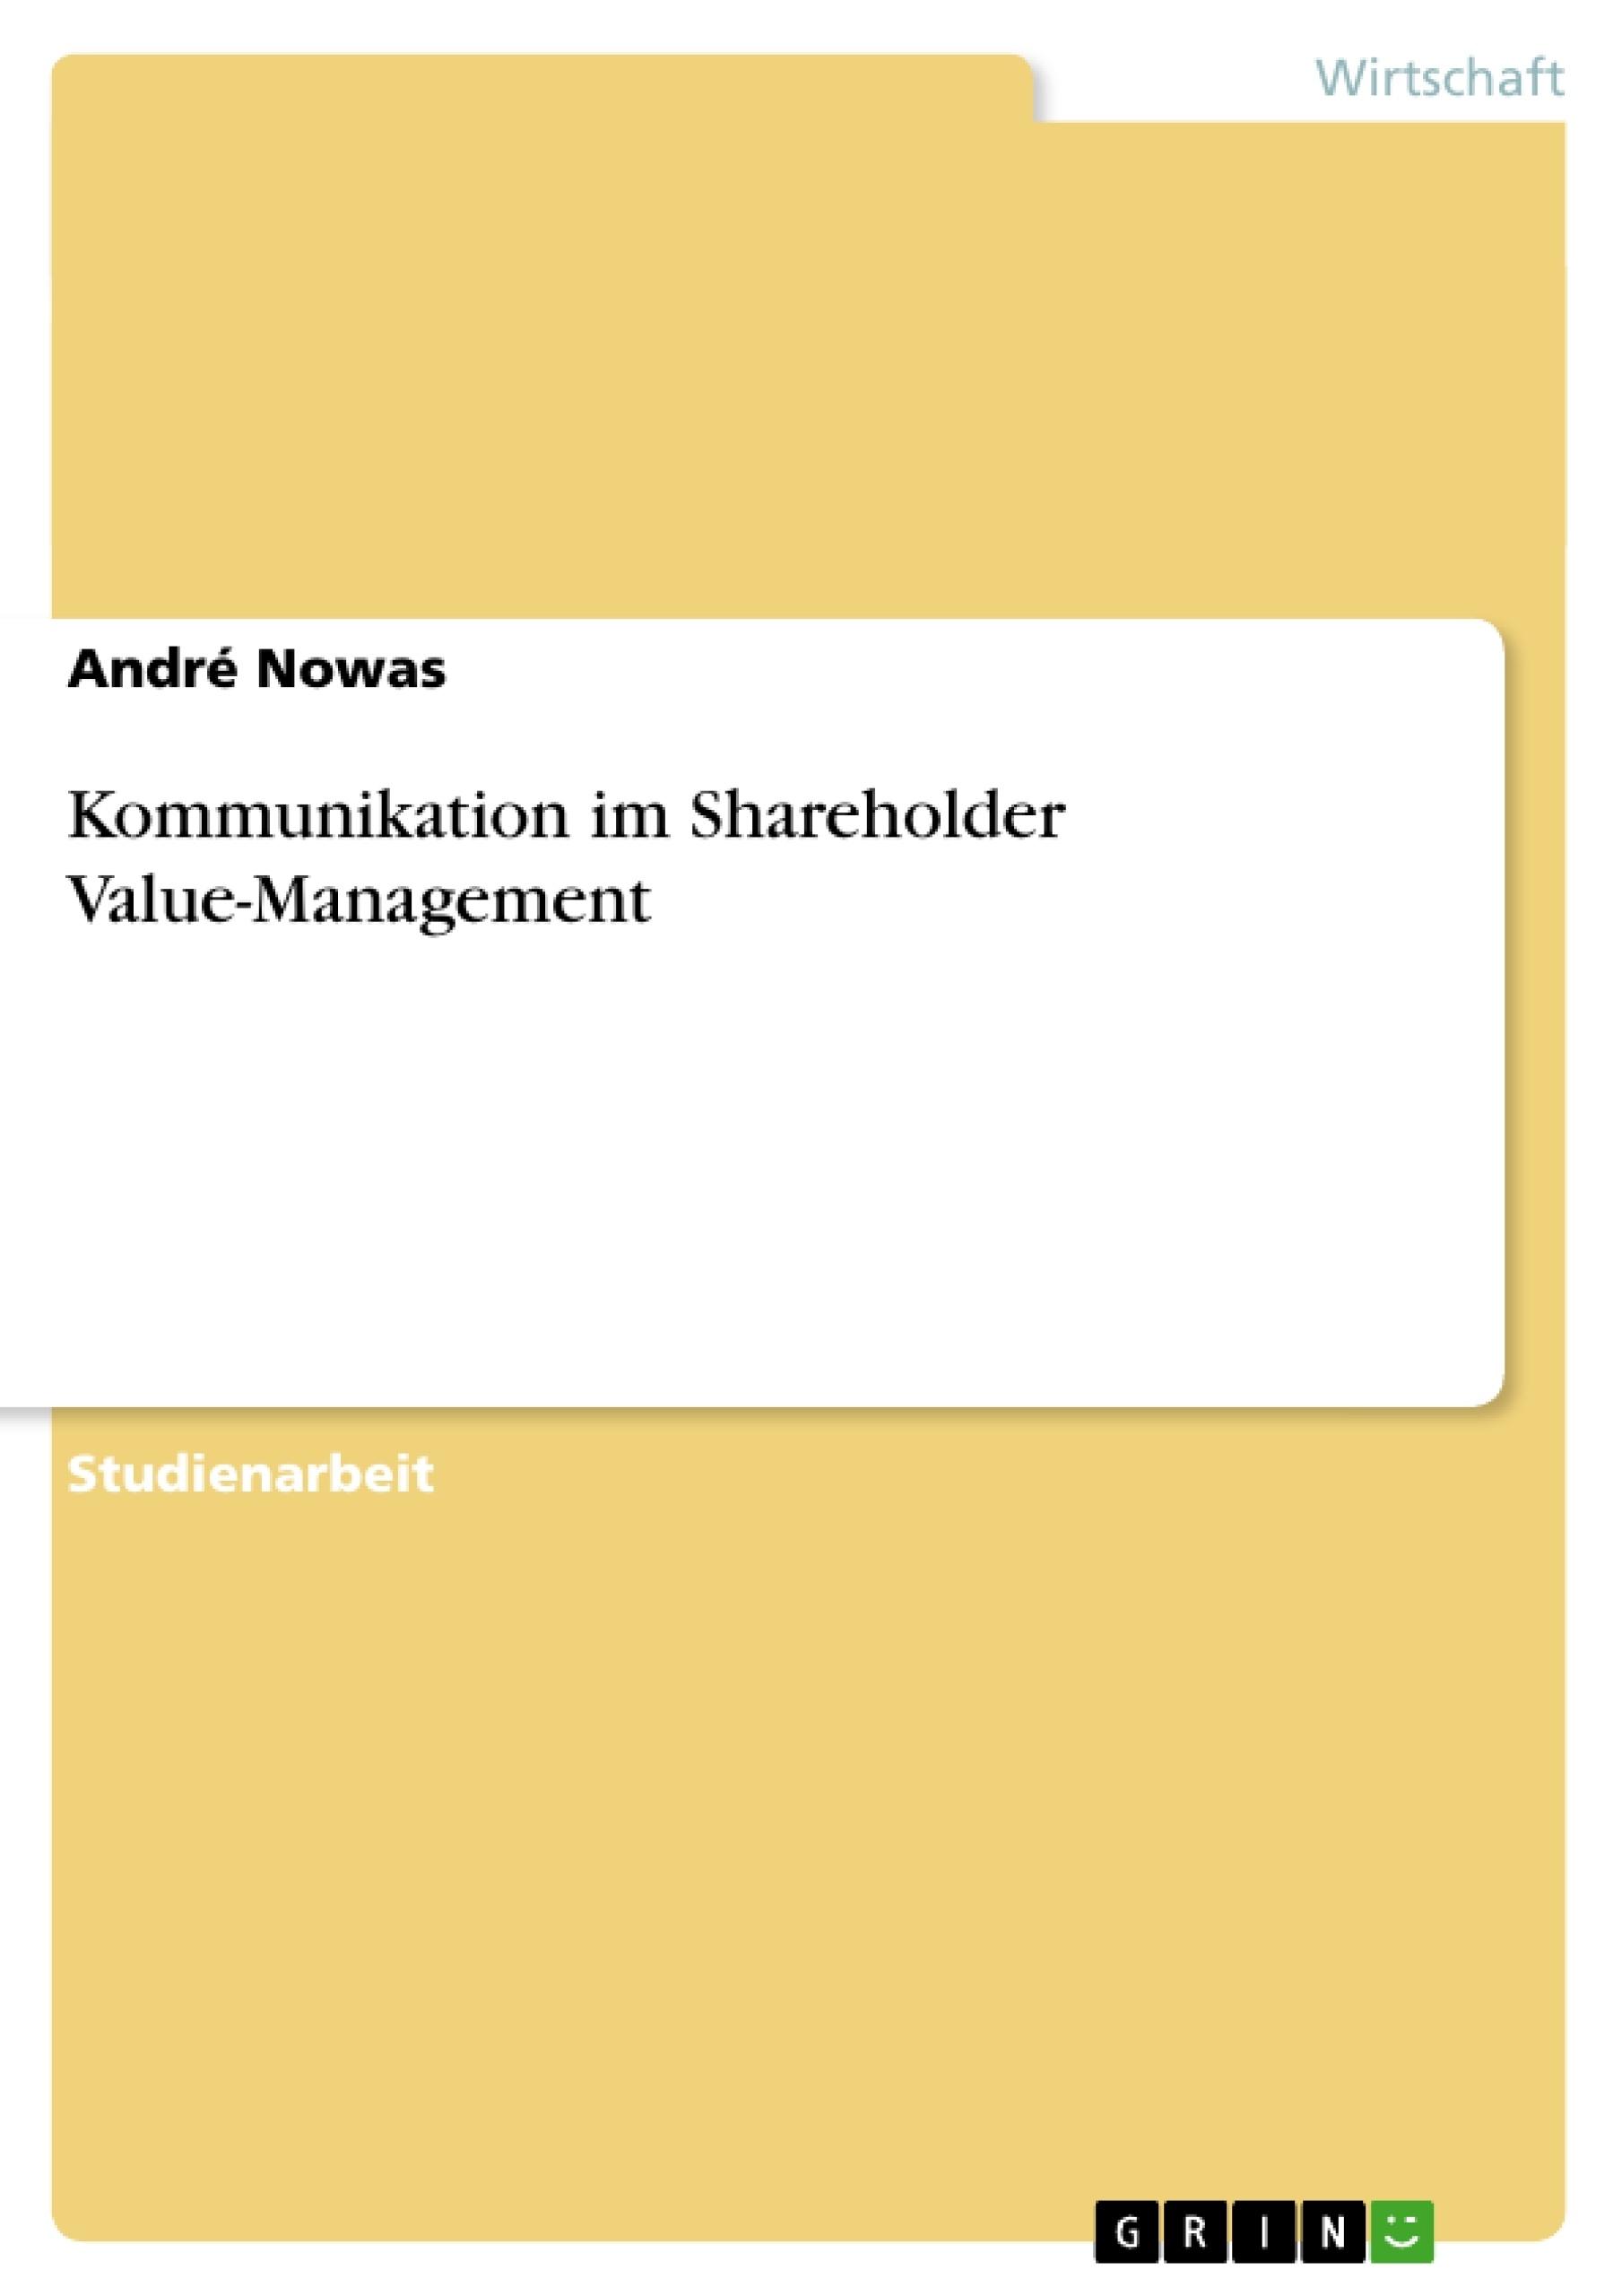 Titel: Kommunikation im Shareholder Value-Management